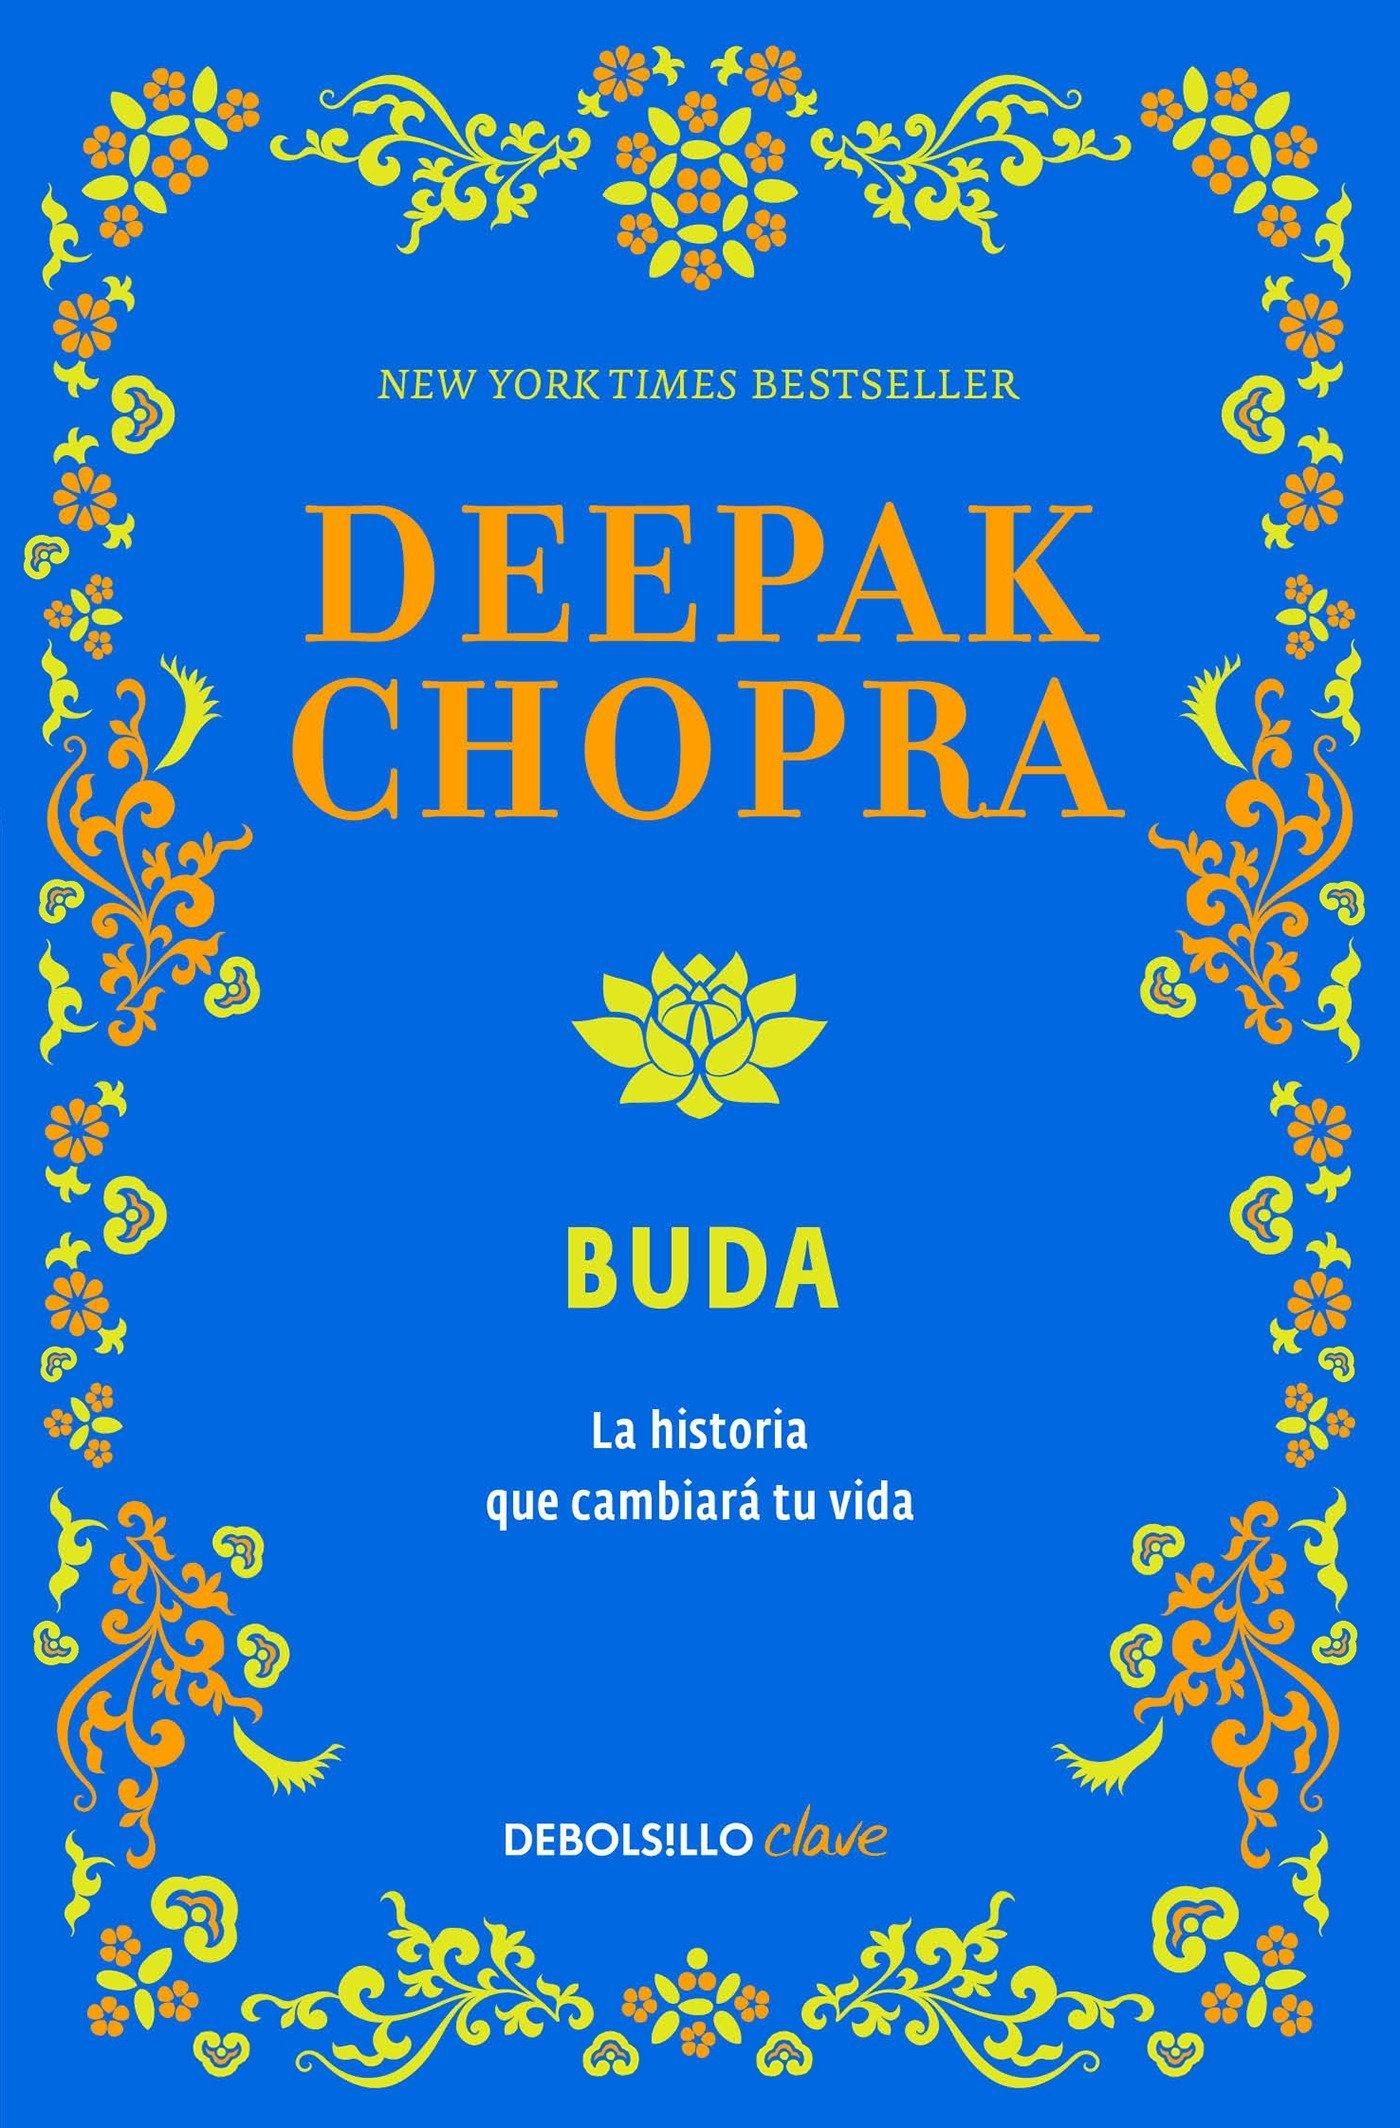 Buda: Una historia de iluminacion / Buddha: A Story of Enlightenment (Spanish Edition) by Deepak Chopra